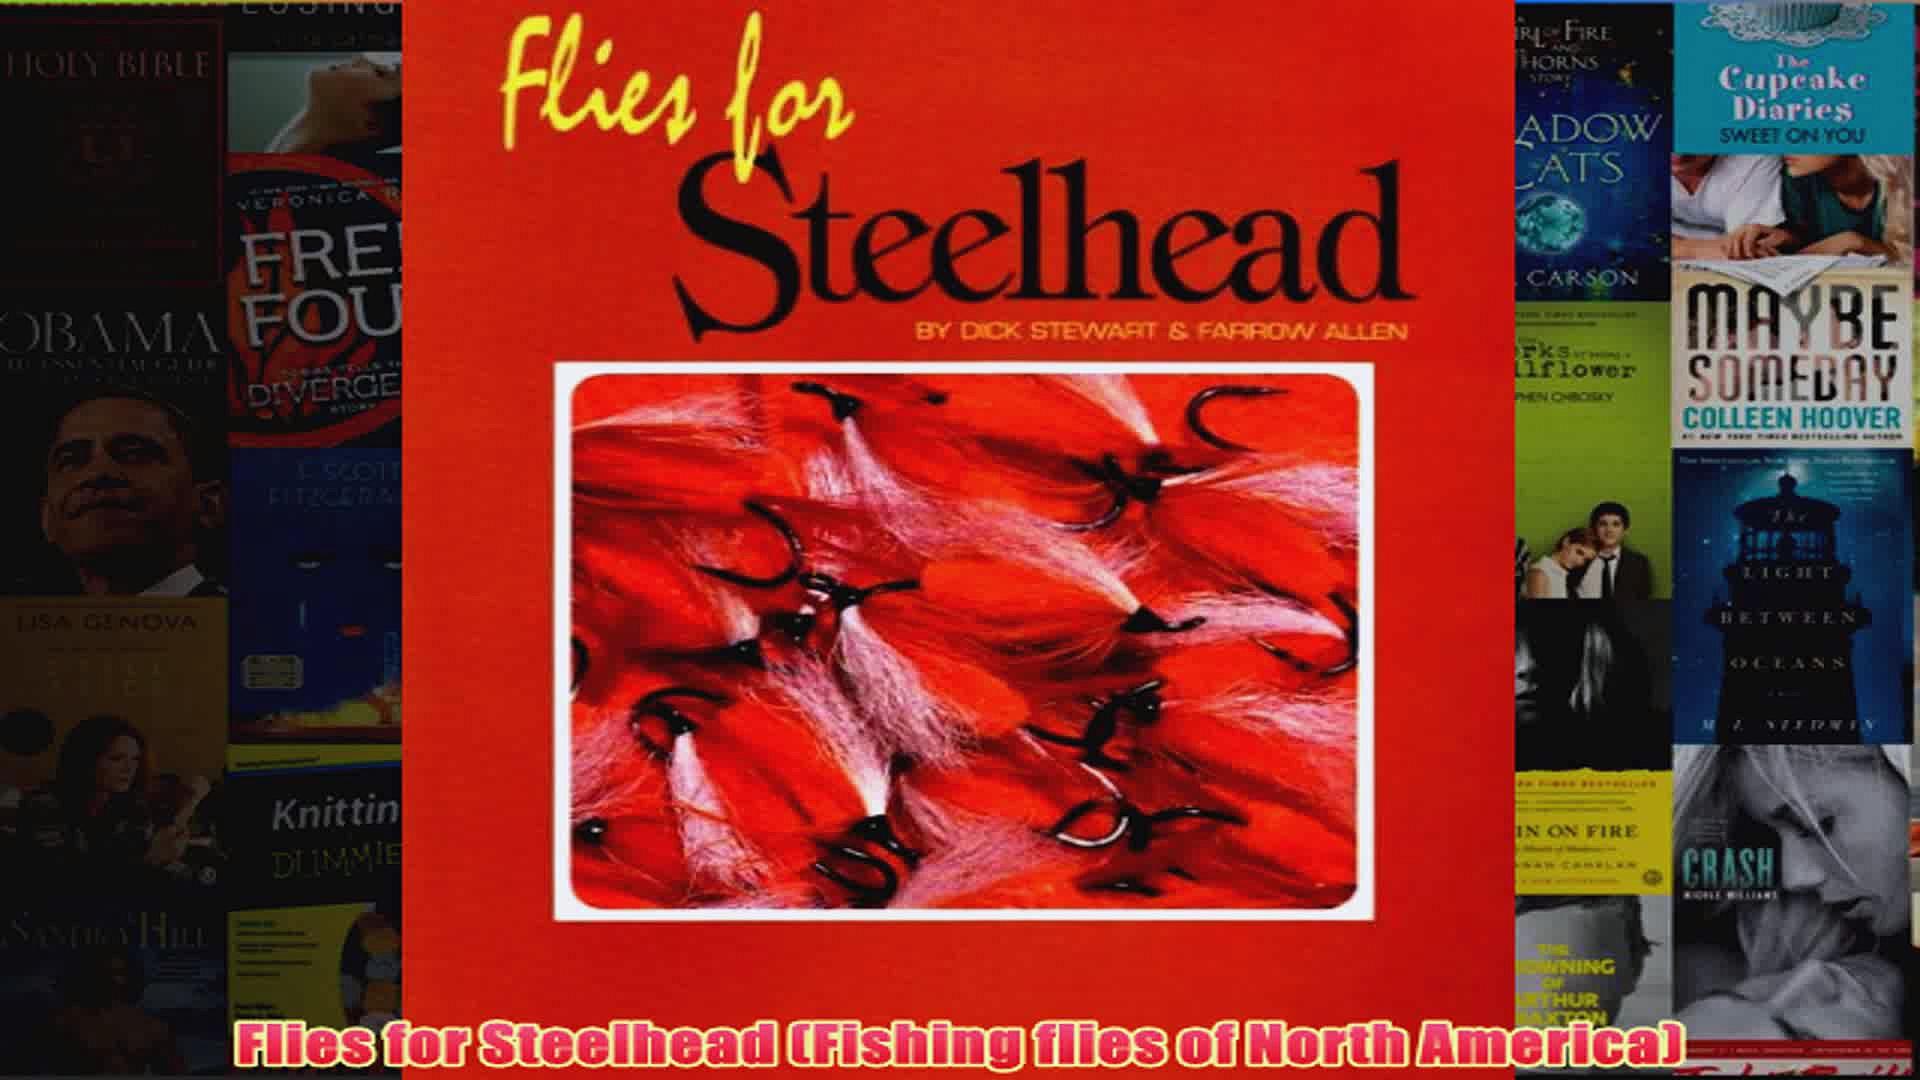 Flies for Steelhead Fishing flies of North America